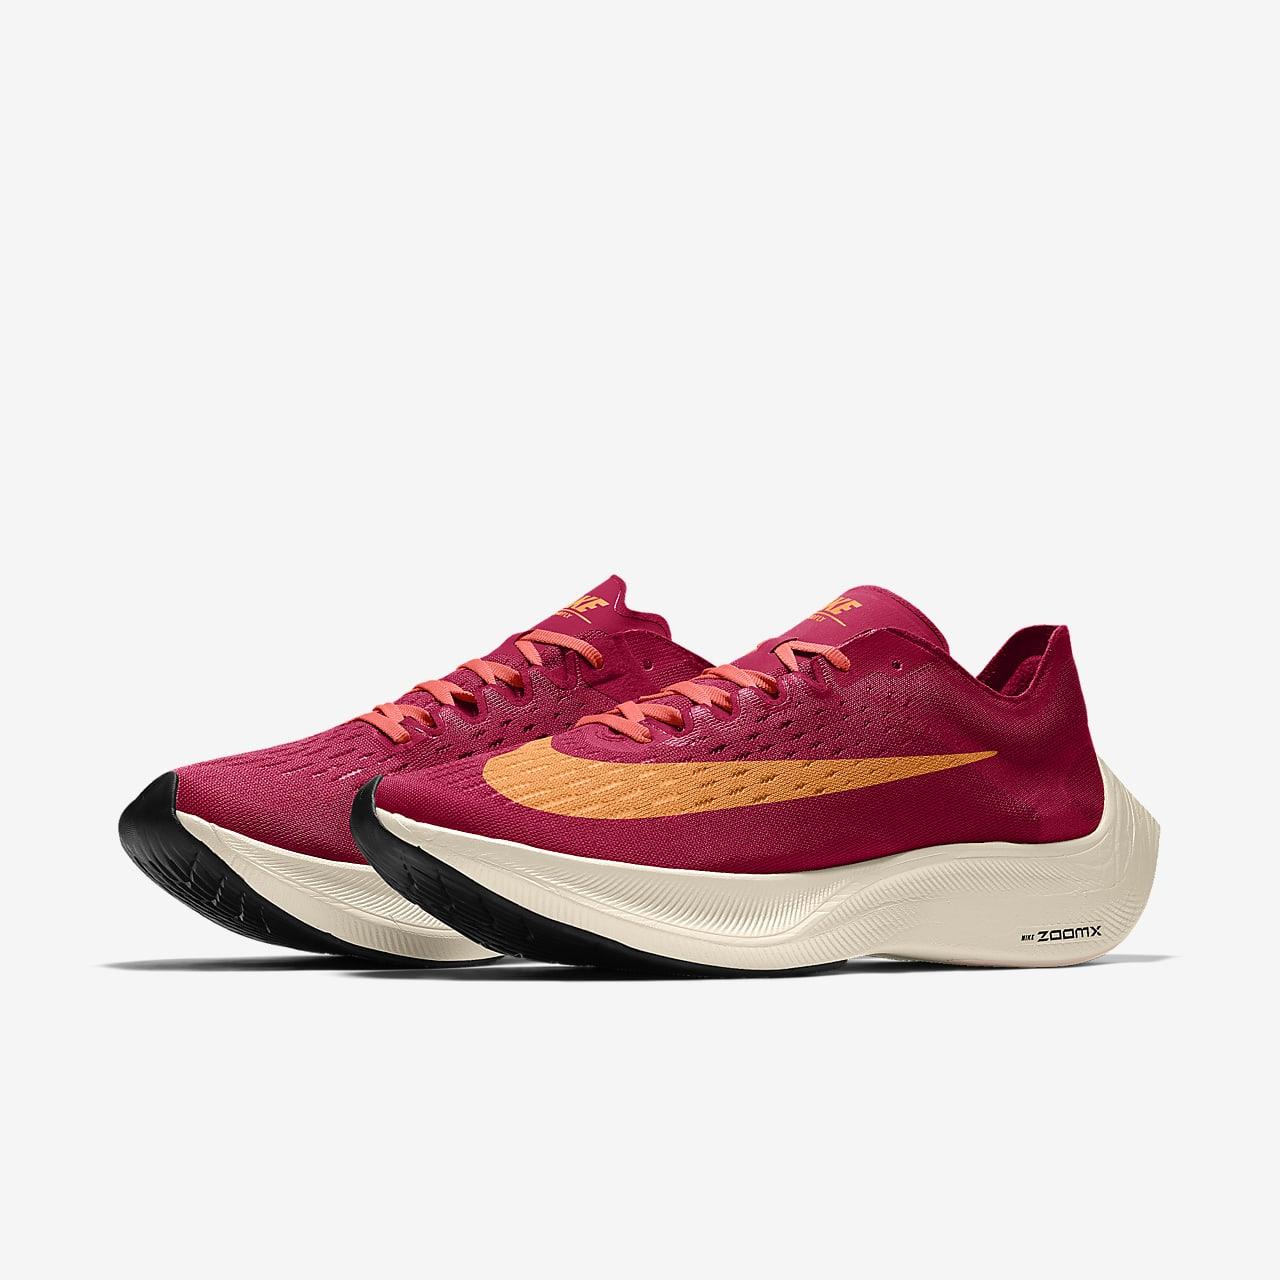 Nike ZoomX Vaporfly Next% By You Custom hardloopschoen